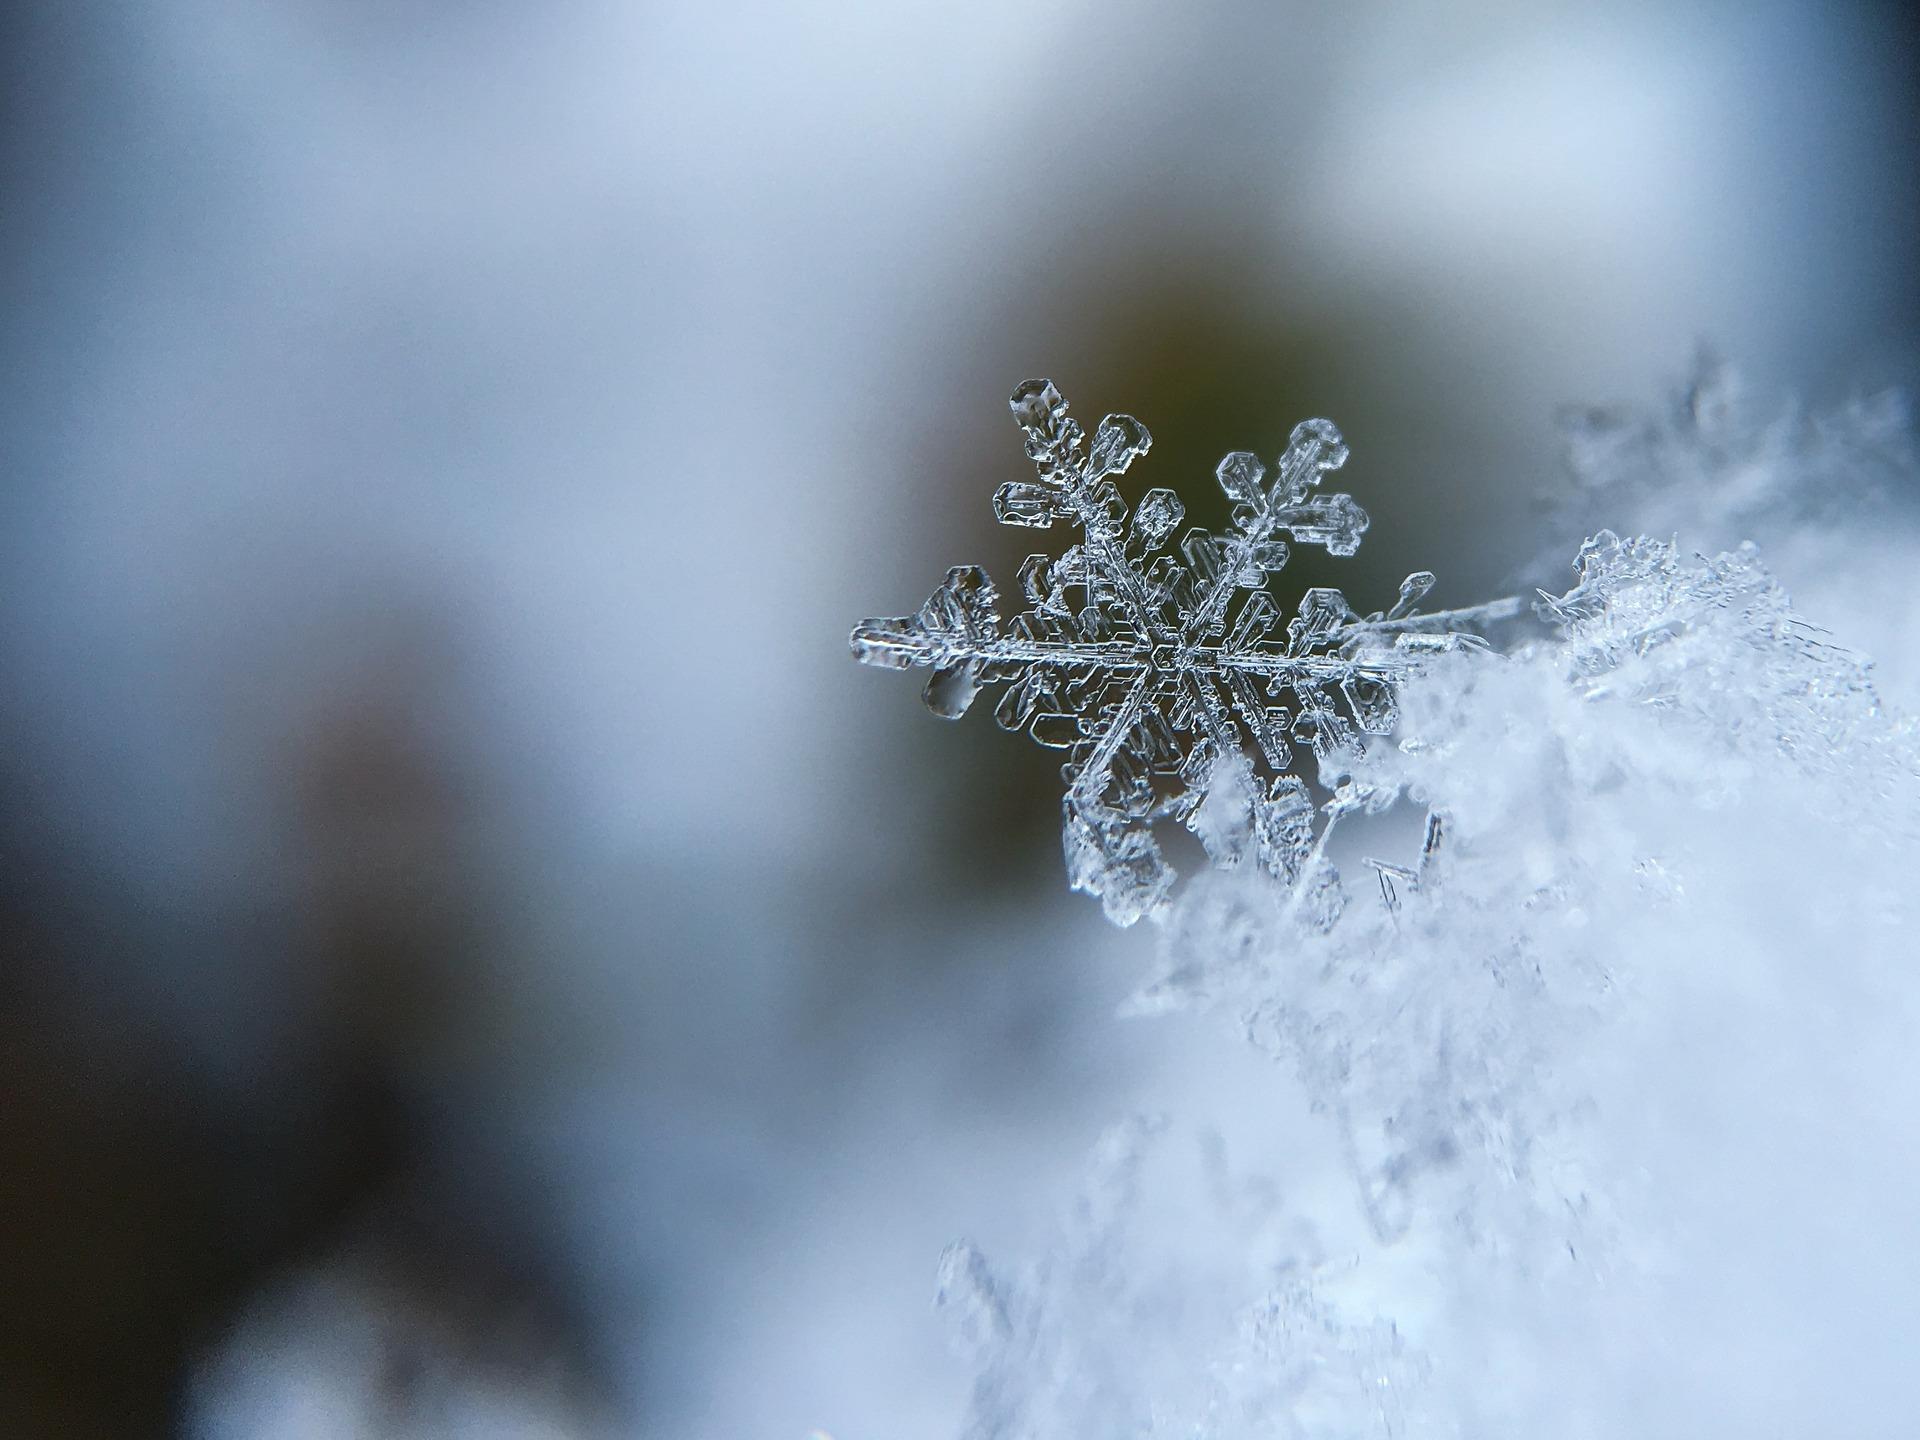 A snowflake. Image courtesy: Pixabay